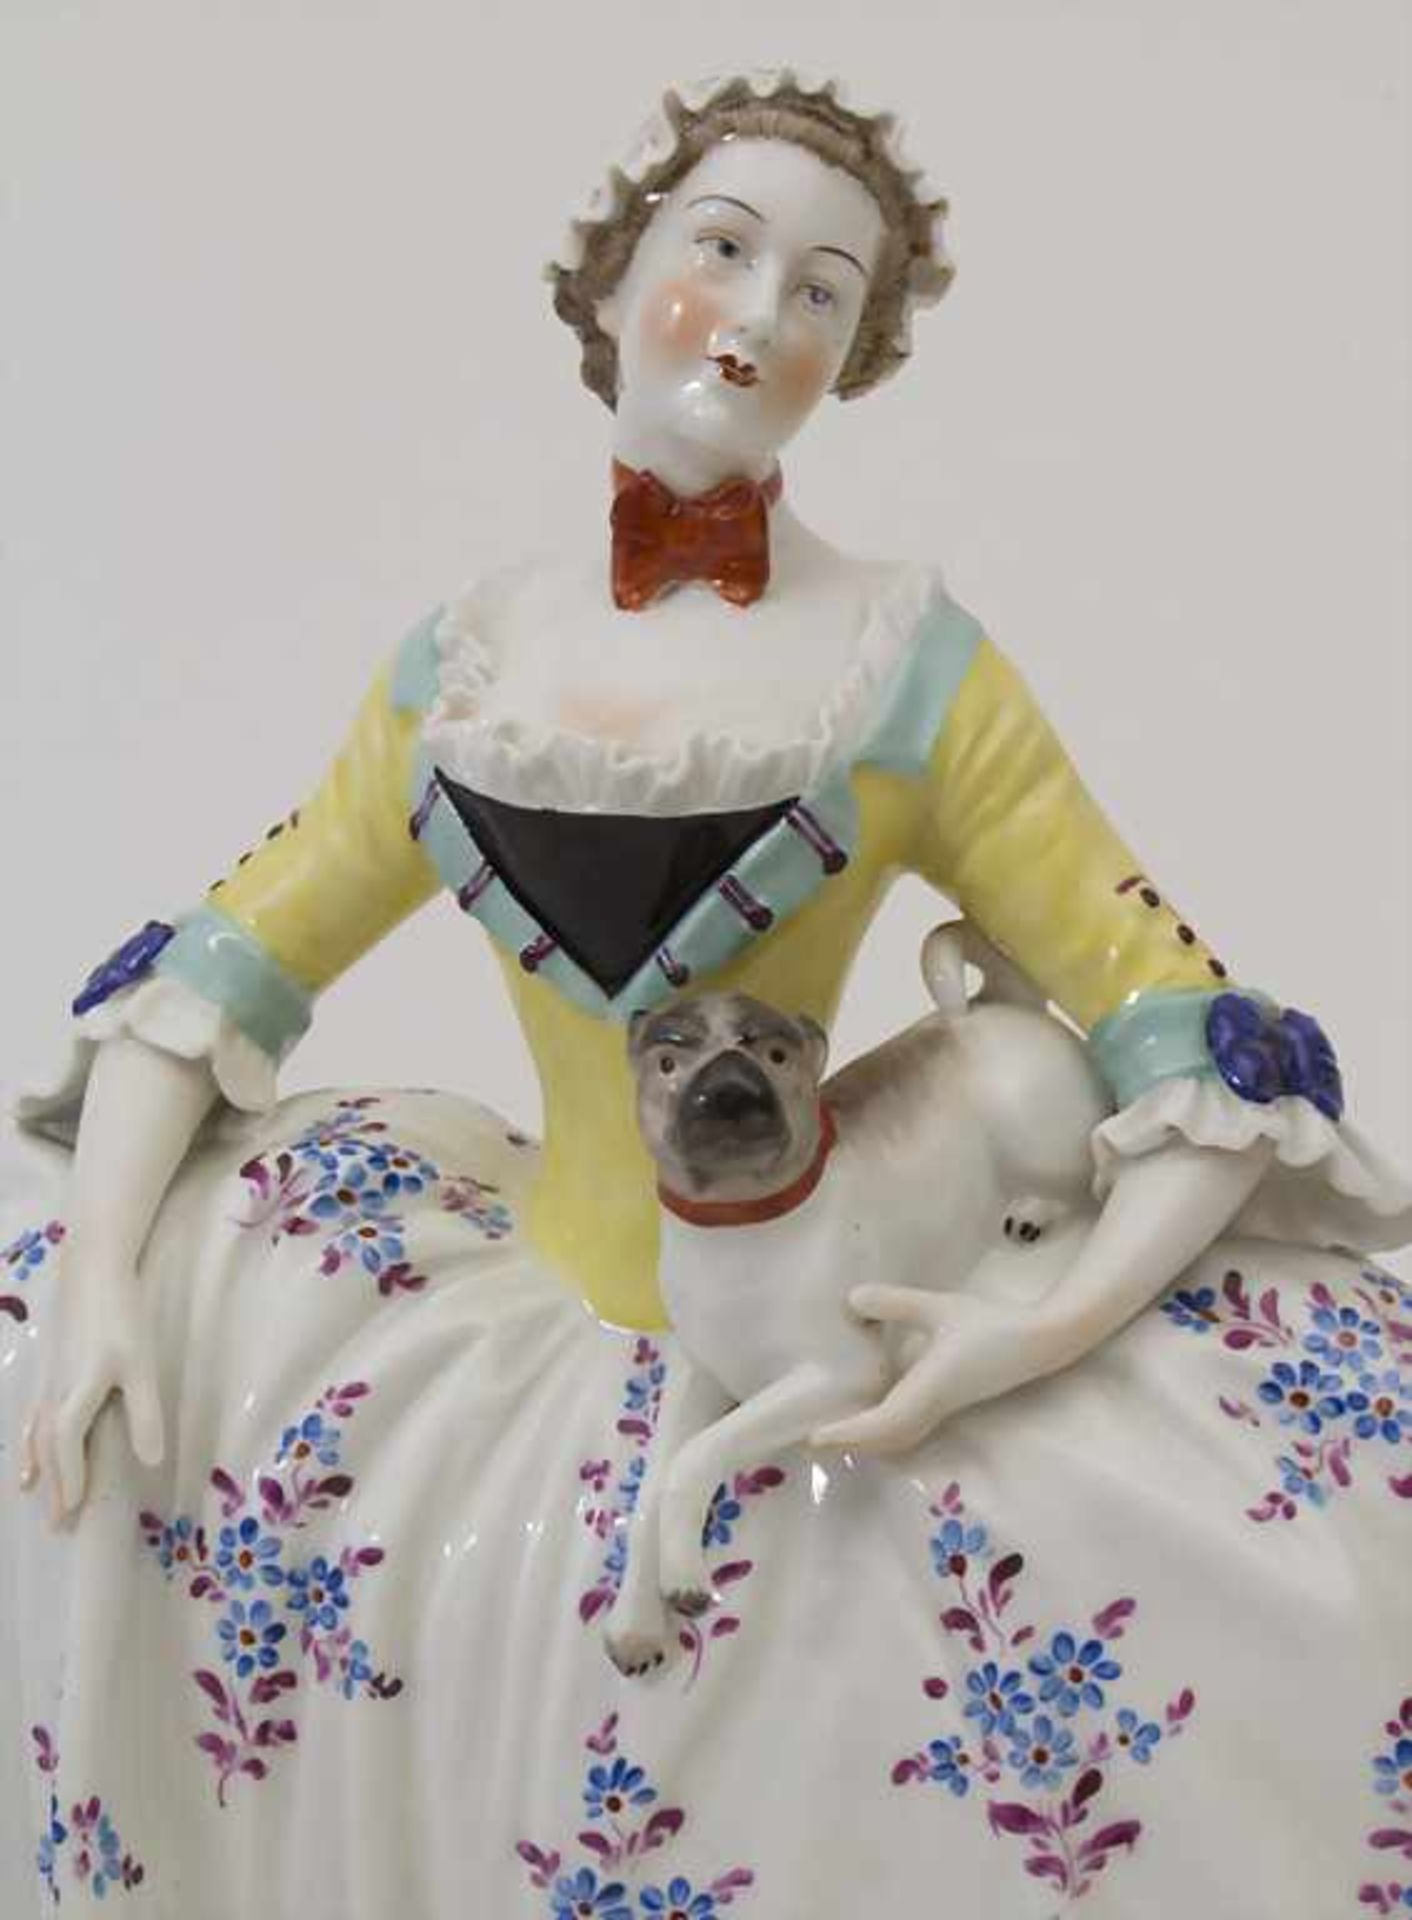 Große Figurengruppe einer Dame mit 2 Möpsen / A large figural group of a lady with 2 pug dogs, - Bild 7 aus 9